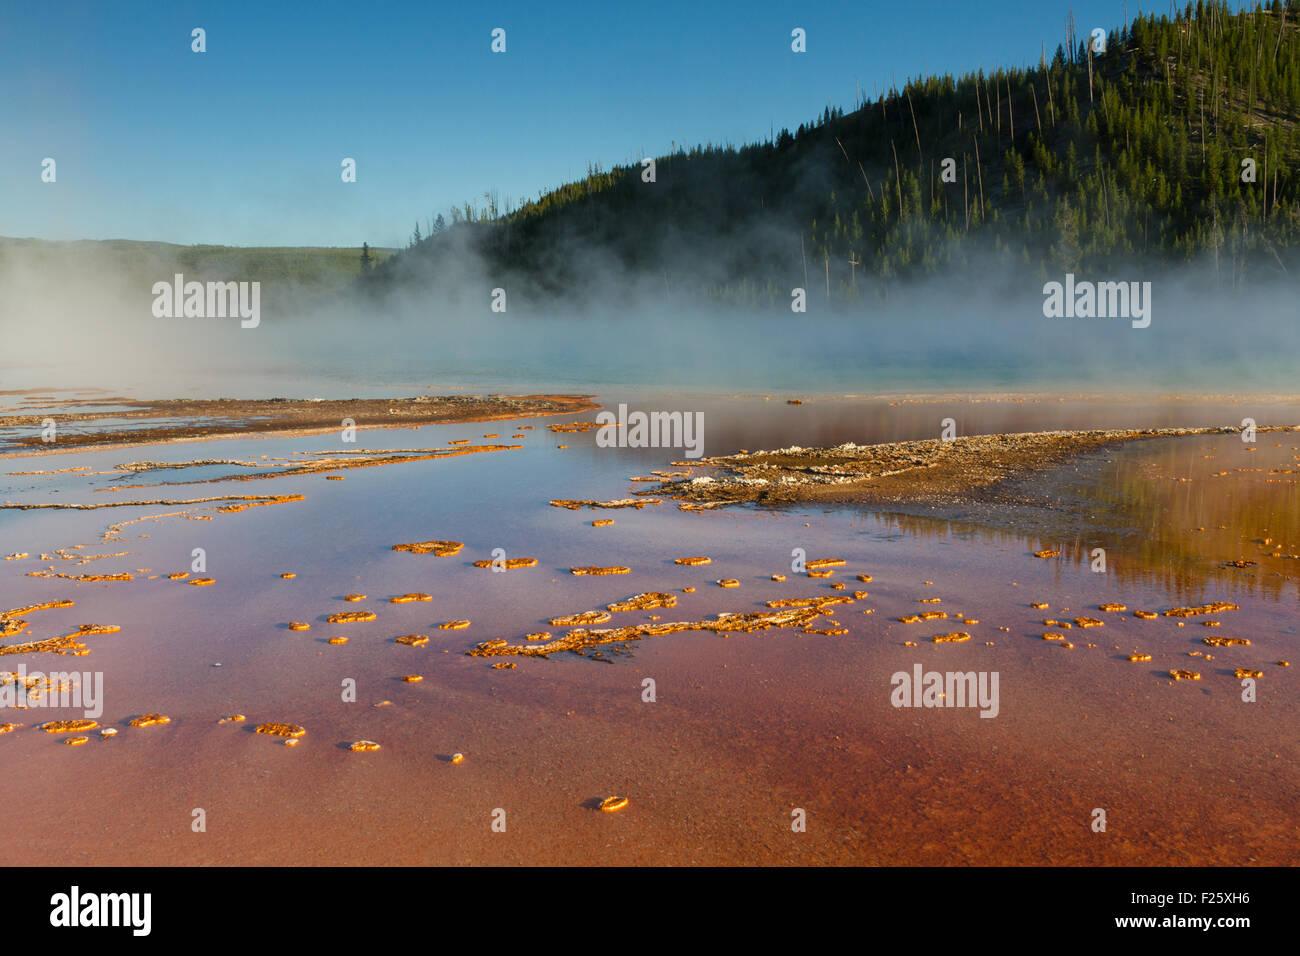 Prisamtic grand printemps, le Parc National de Yellowstone, Wyoming, USA Banque D'Images